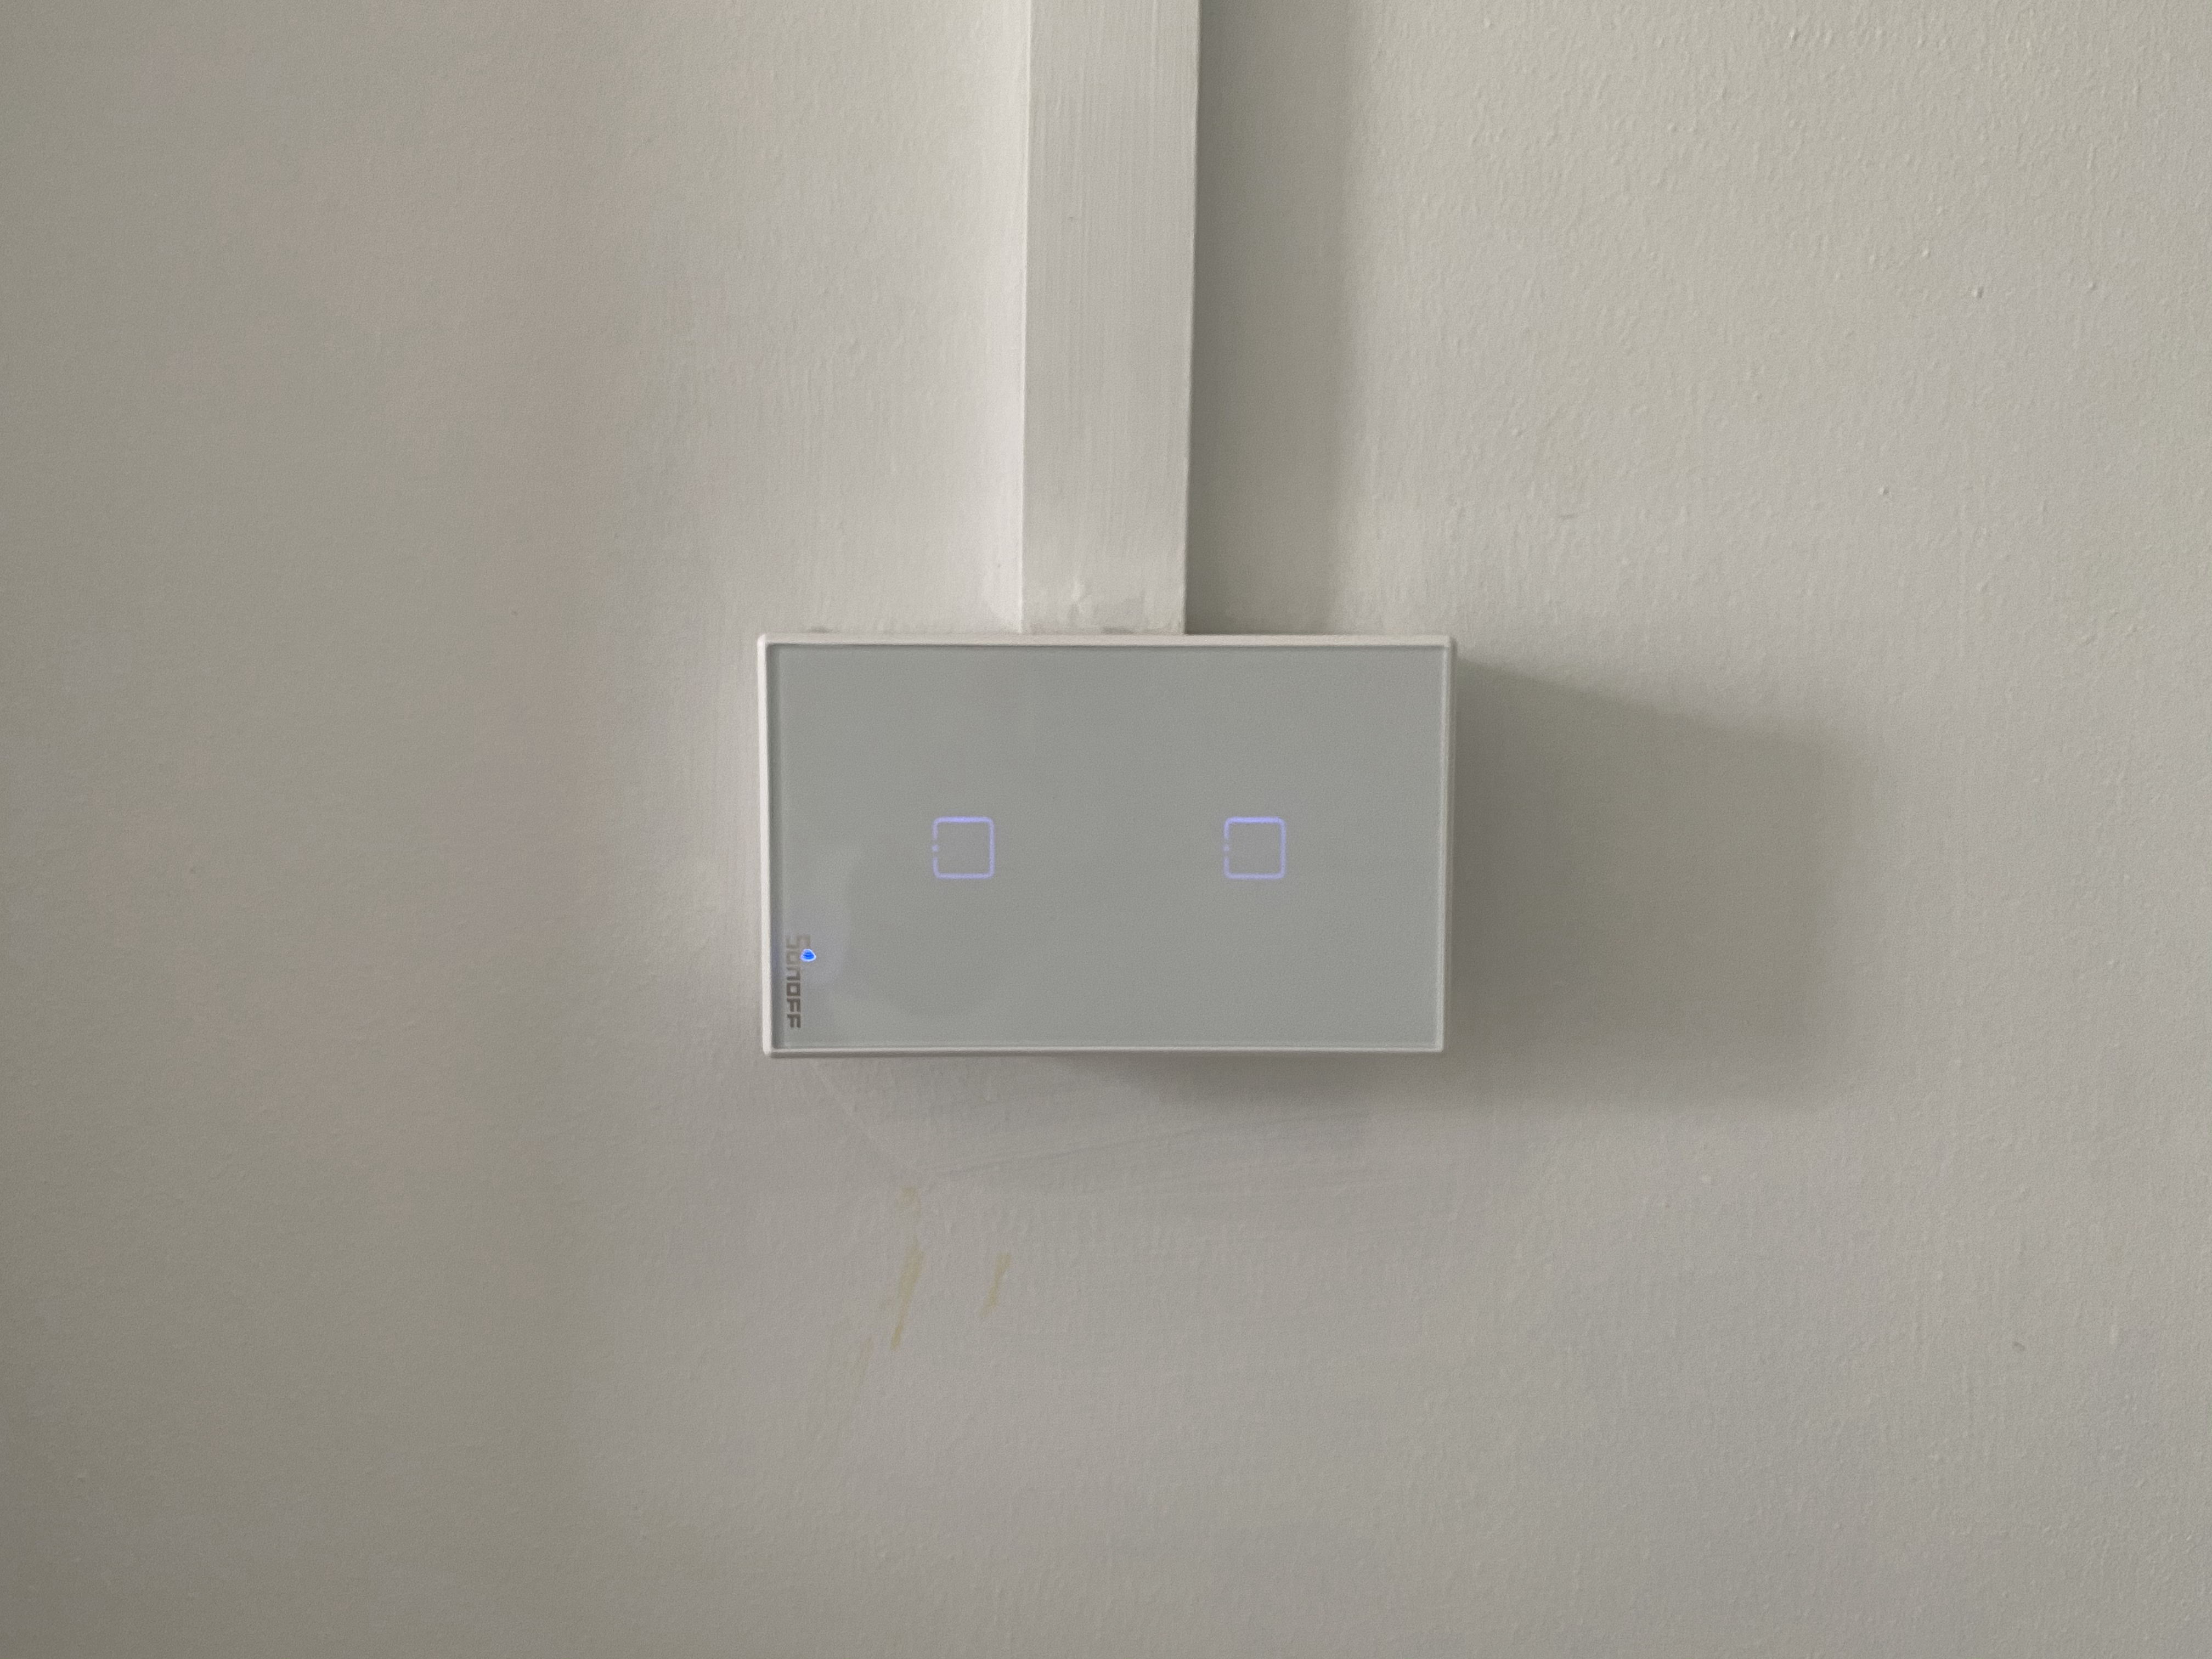 Smart Home รีวิว IoT